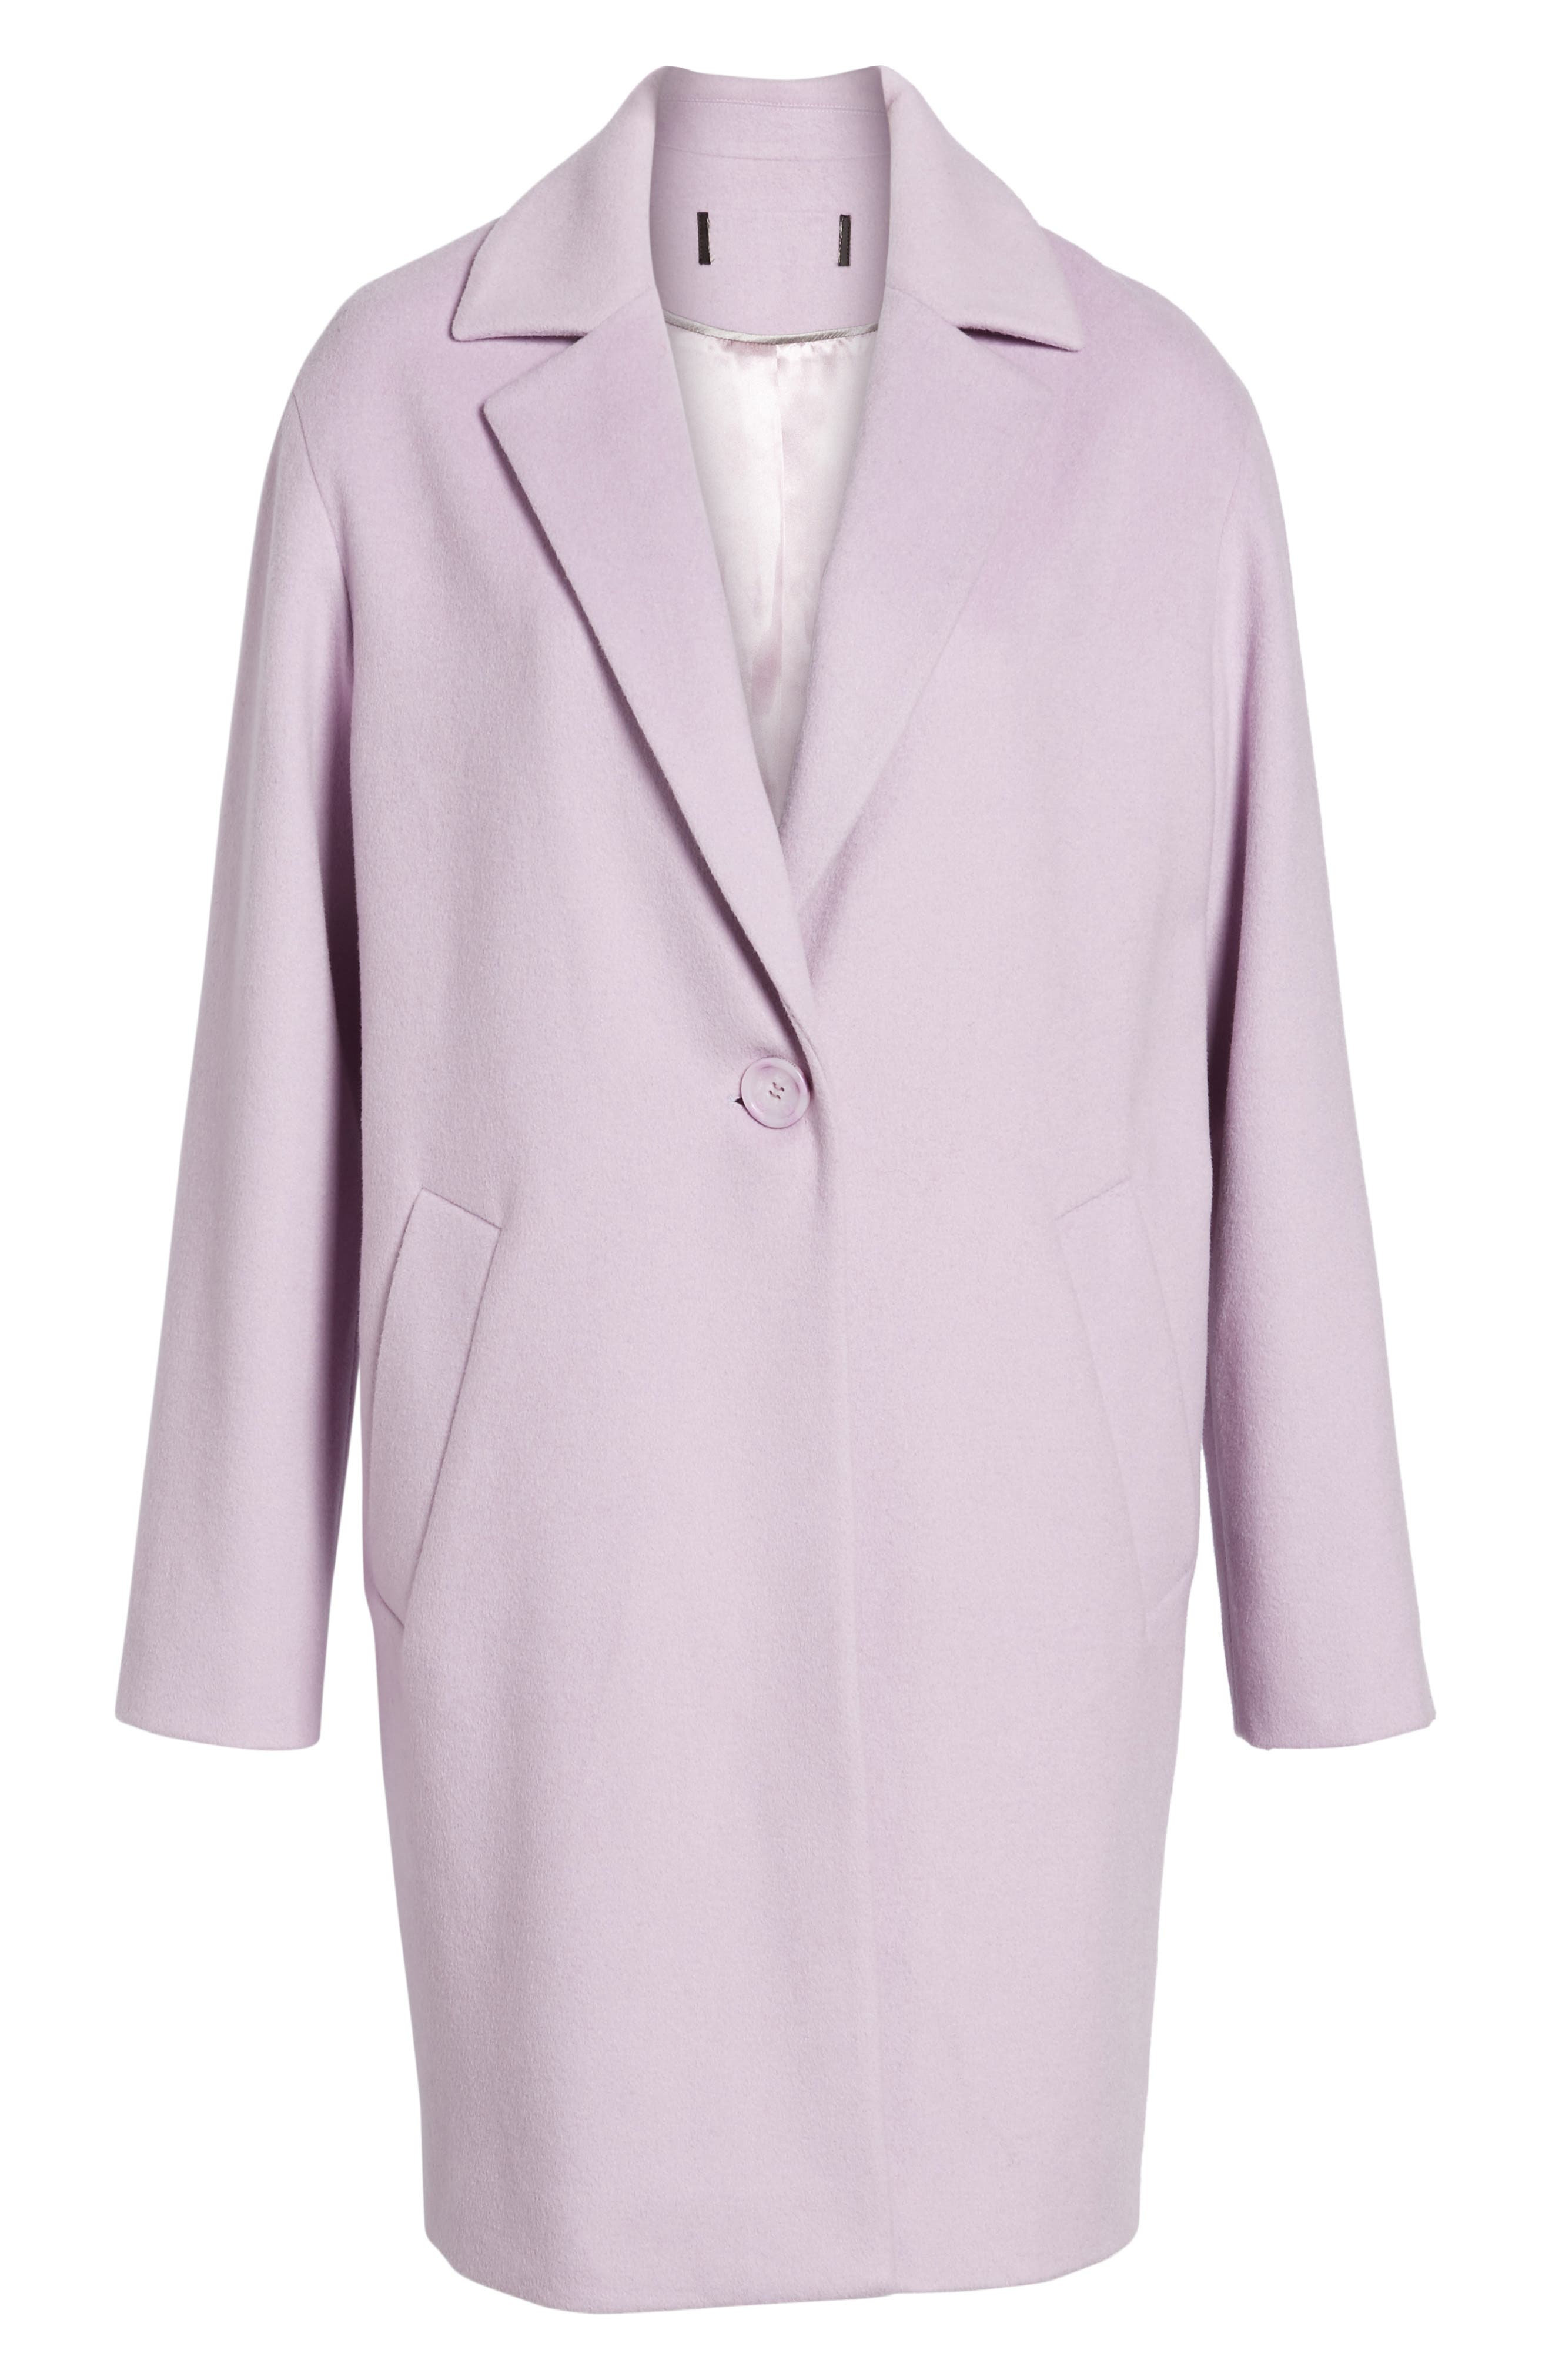 Wool Blend Coat,                             Alternate thumbnail 7, color,                             Icy Lavendar